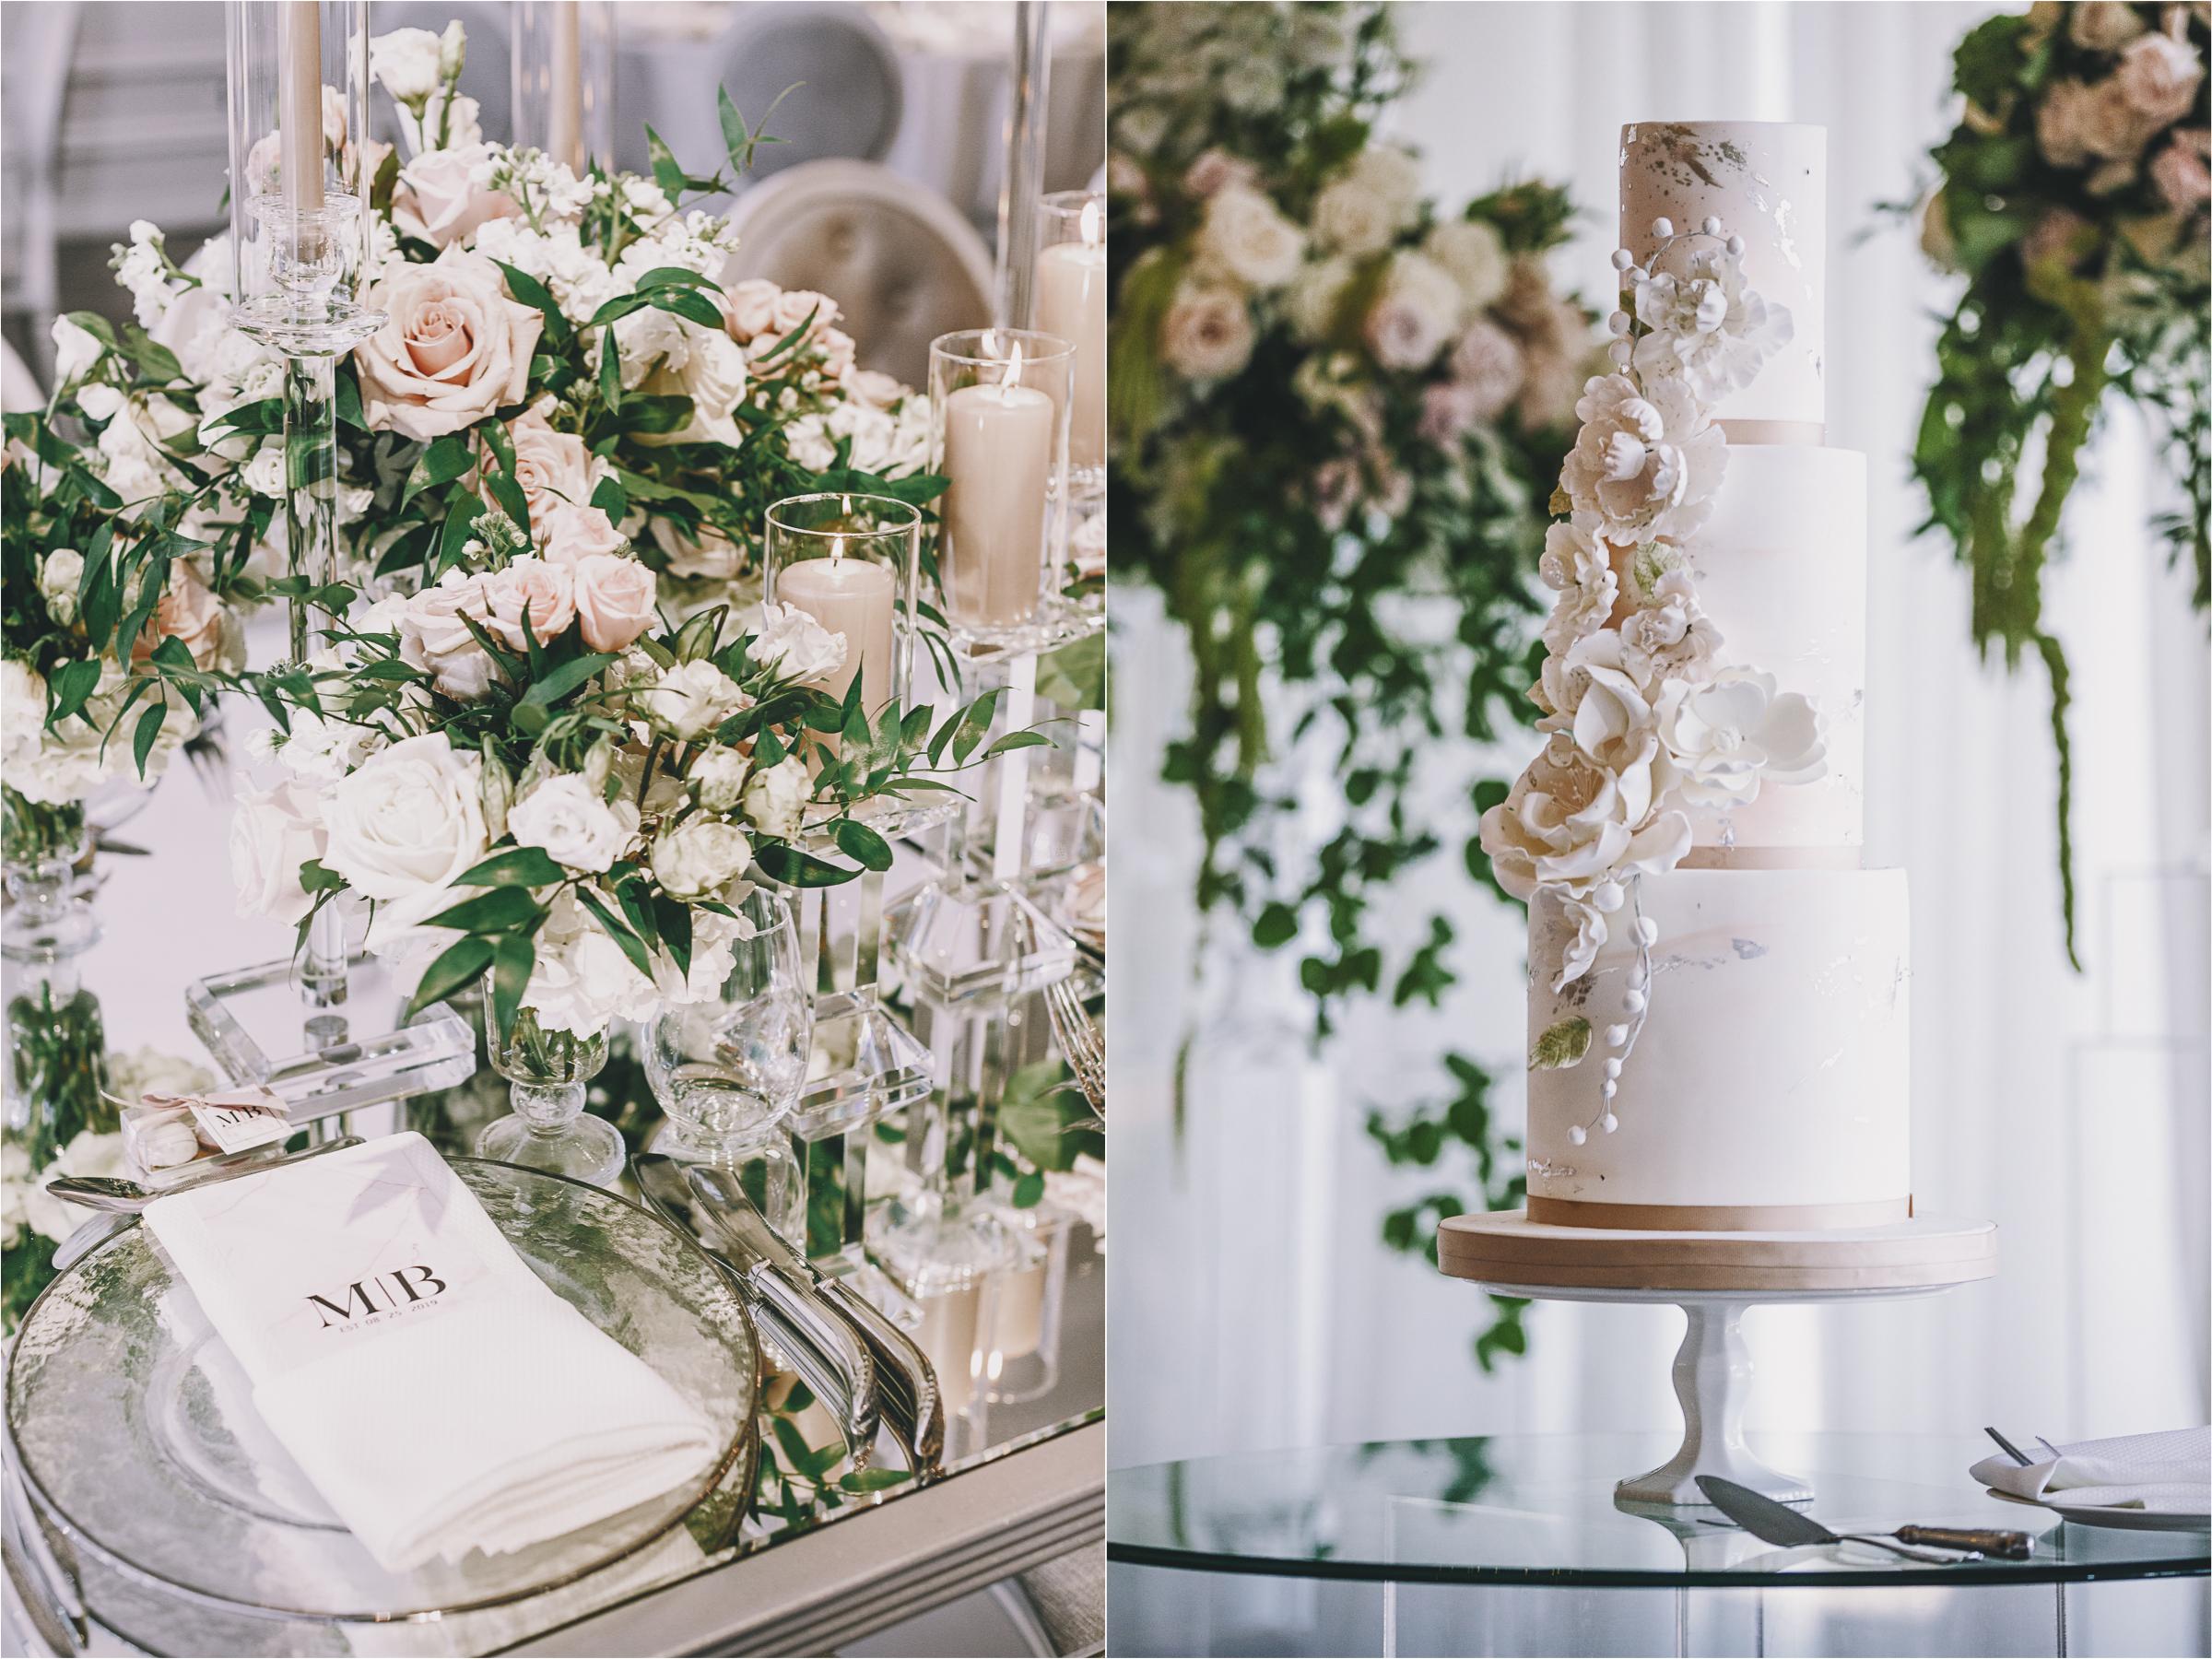 Lavish wedding tables at the Arlington Estate